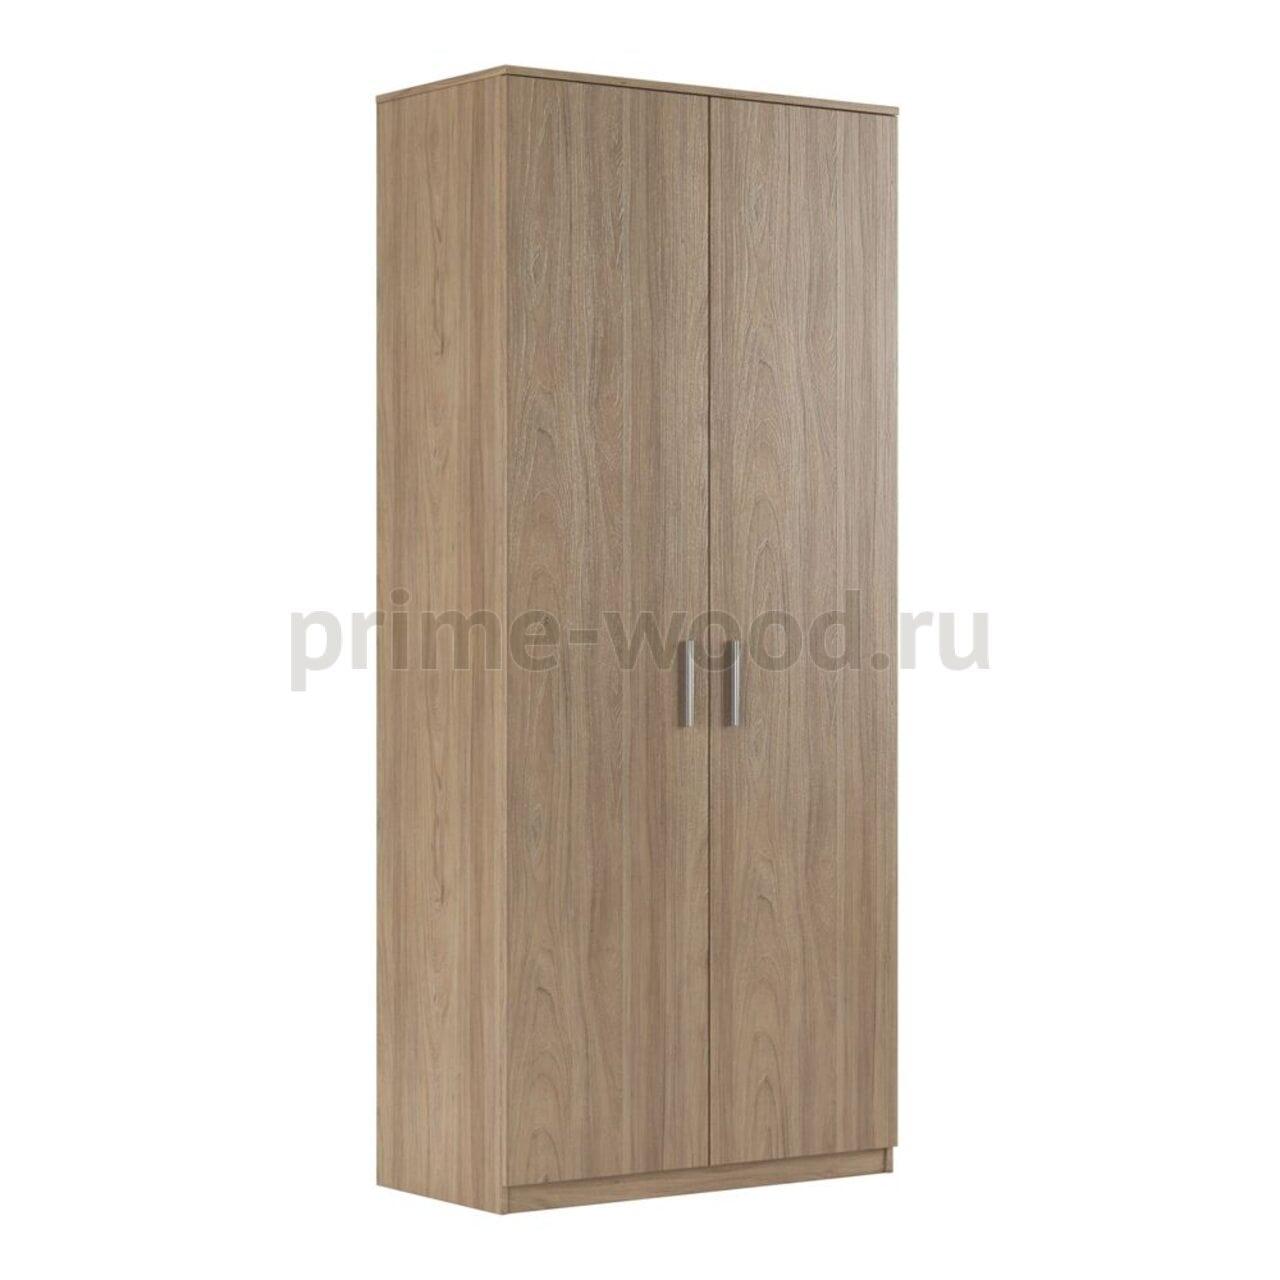 Шкаф для бумаг глухой, древесный  ASTI 90x45x205 - фото 1